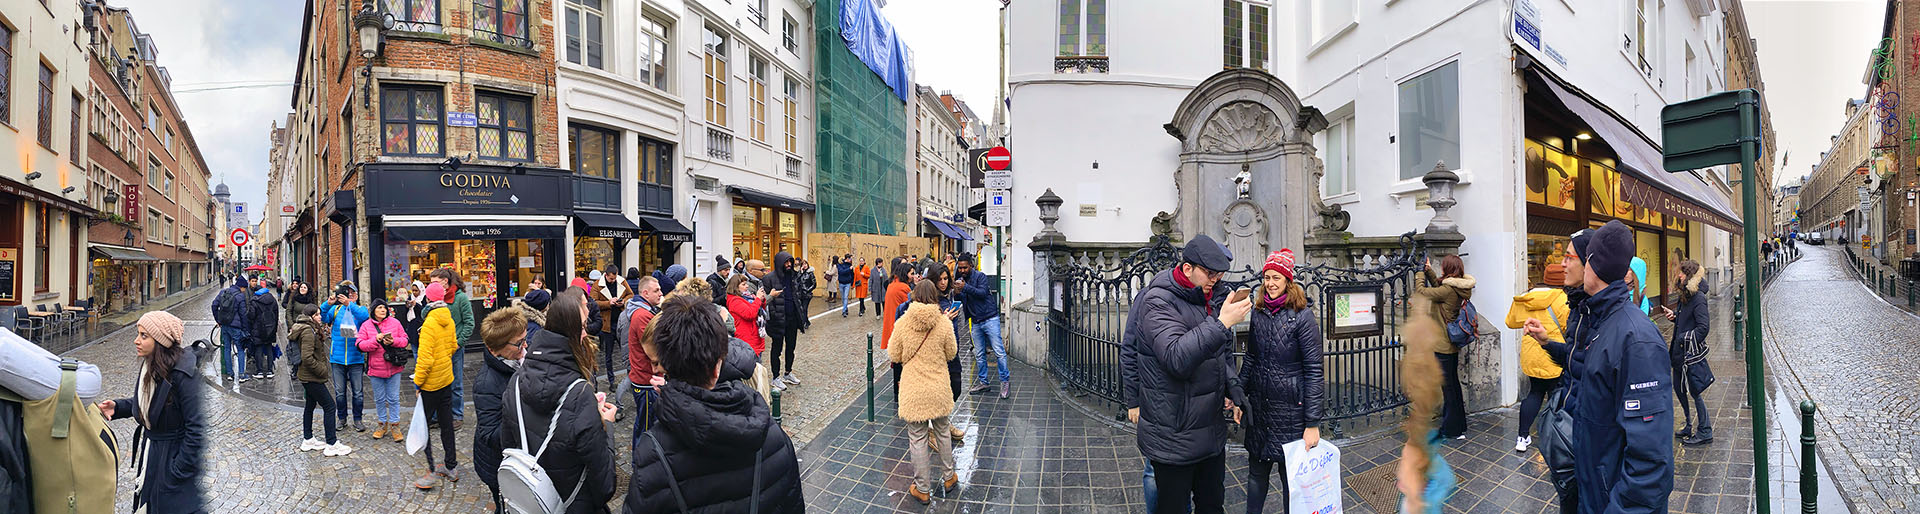 02-Brussels-MannekinPisPano